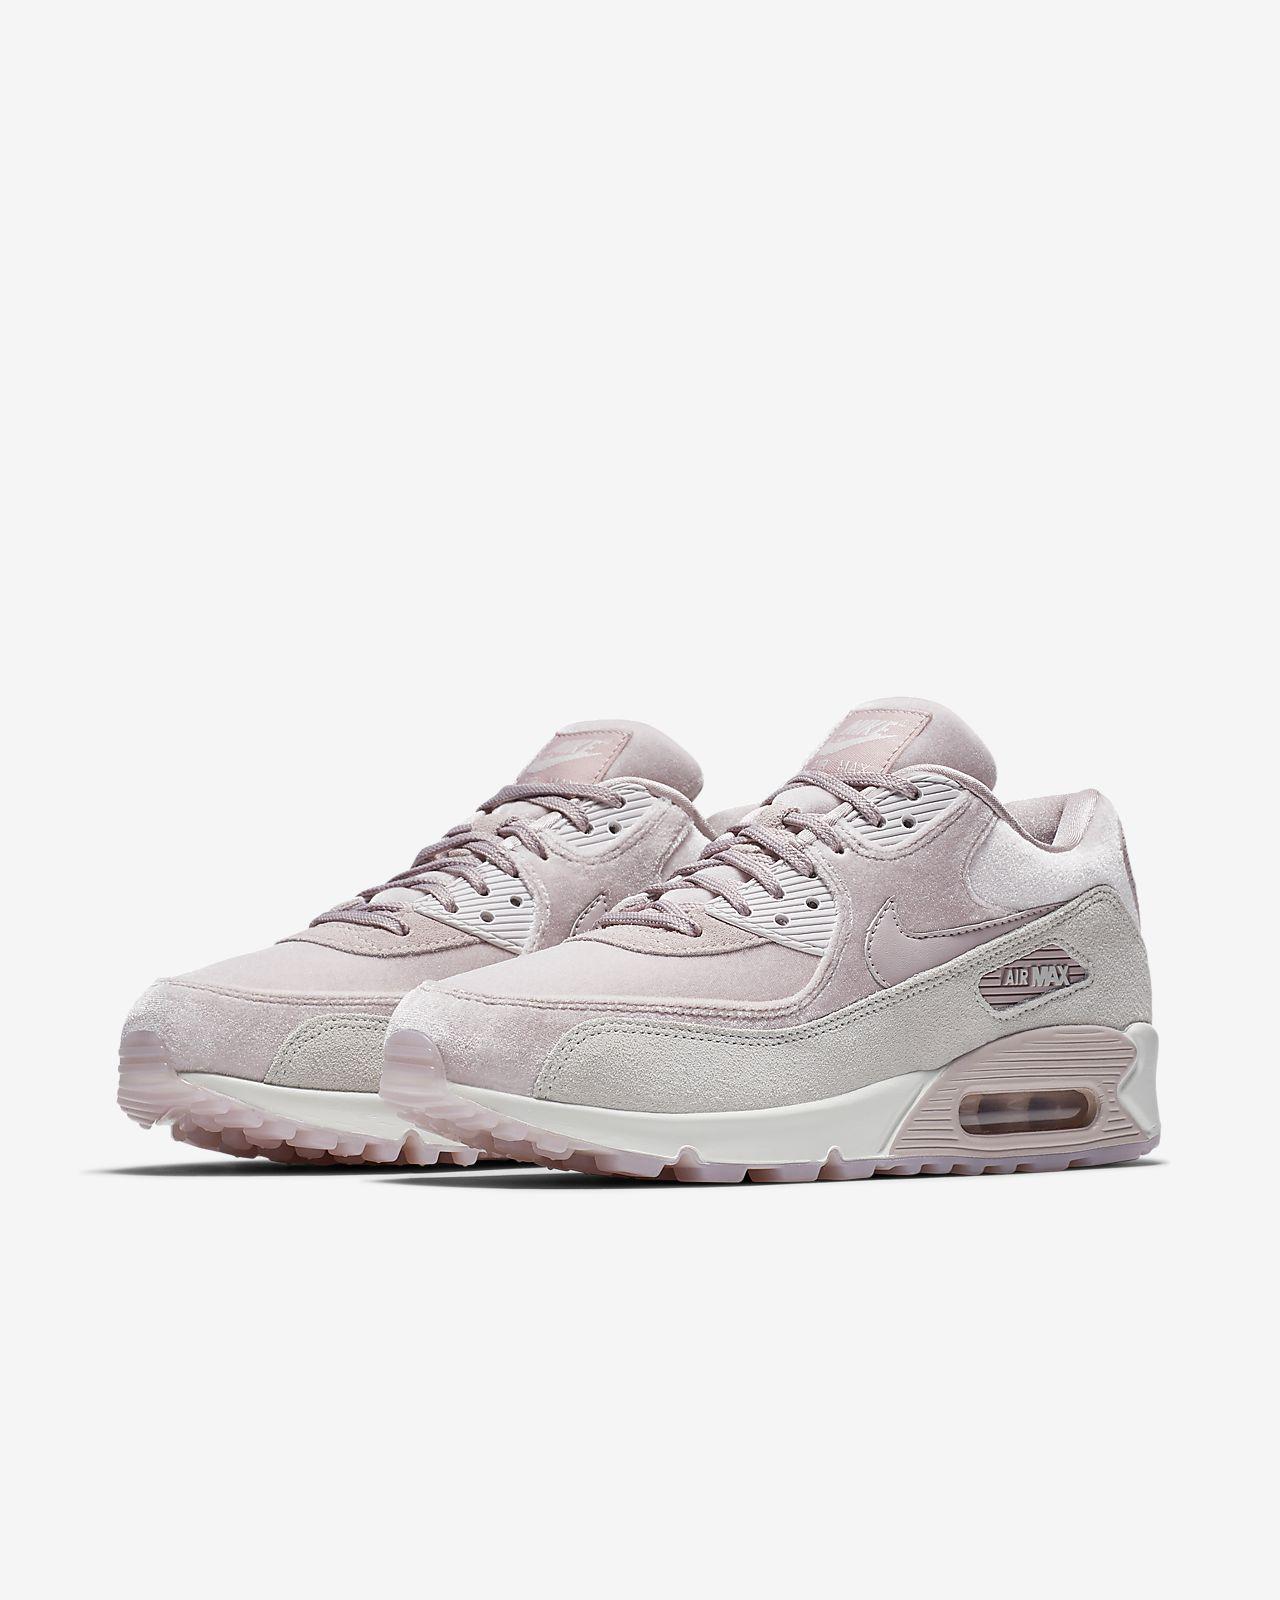 innovative design 392ef ae107 Nike Air Max 90 Lx W Lo Sneaker Schuhe pink